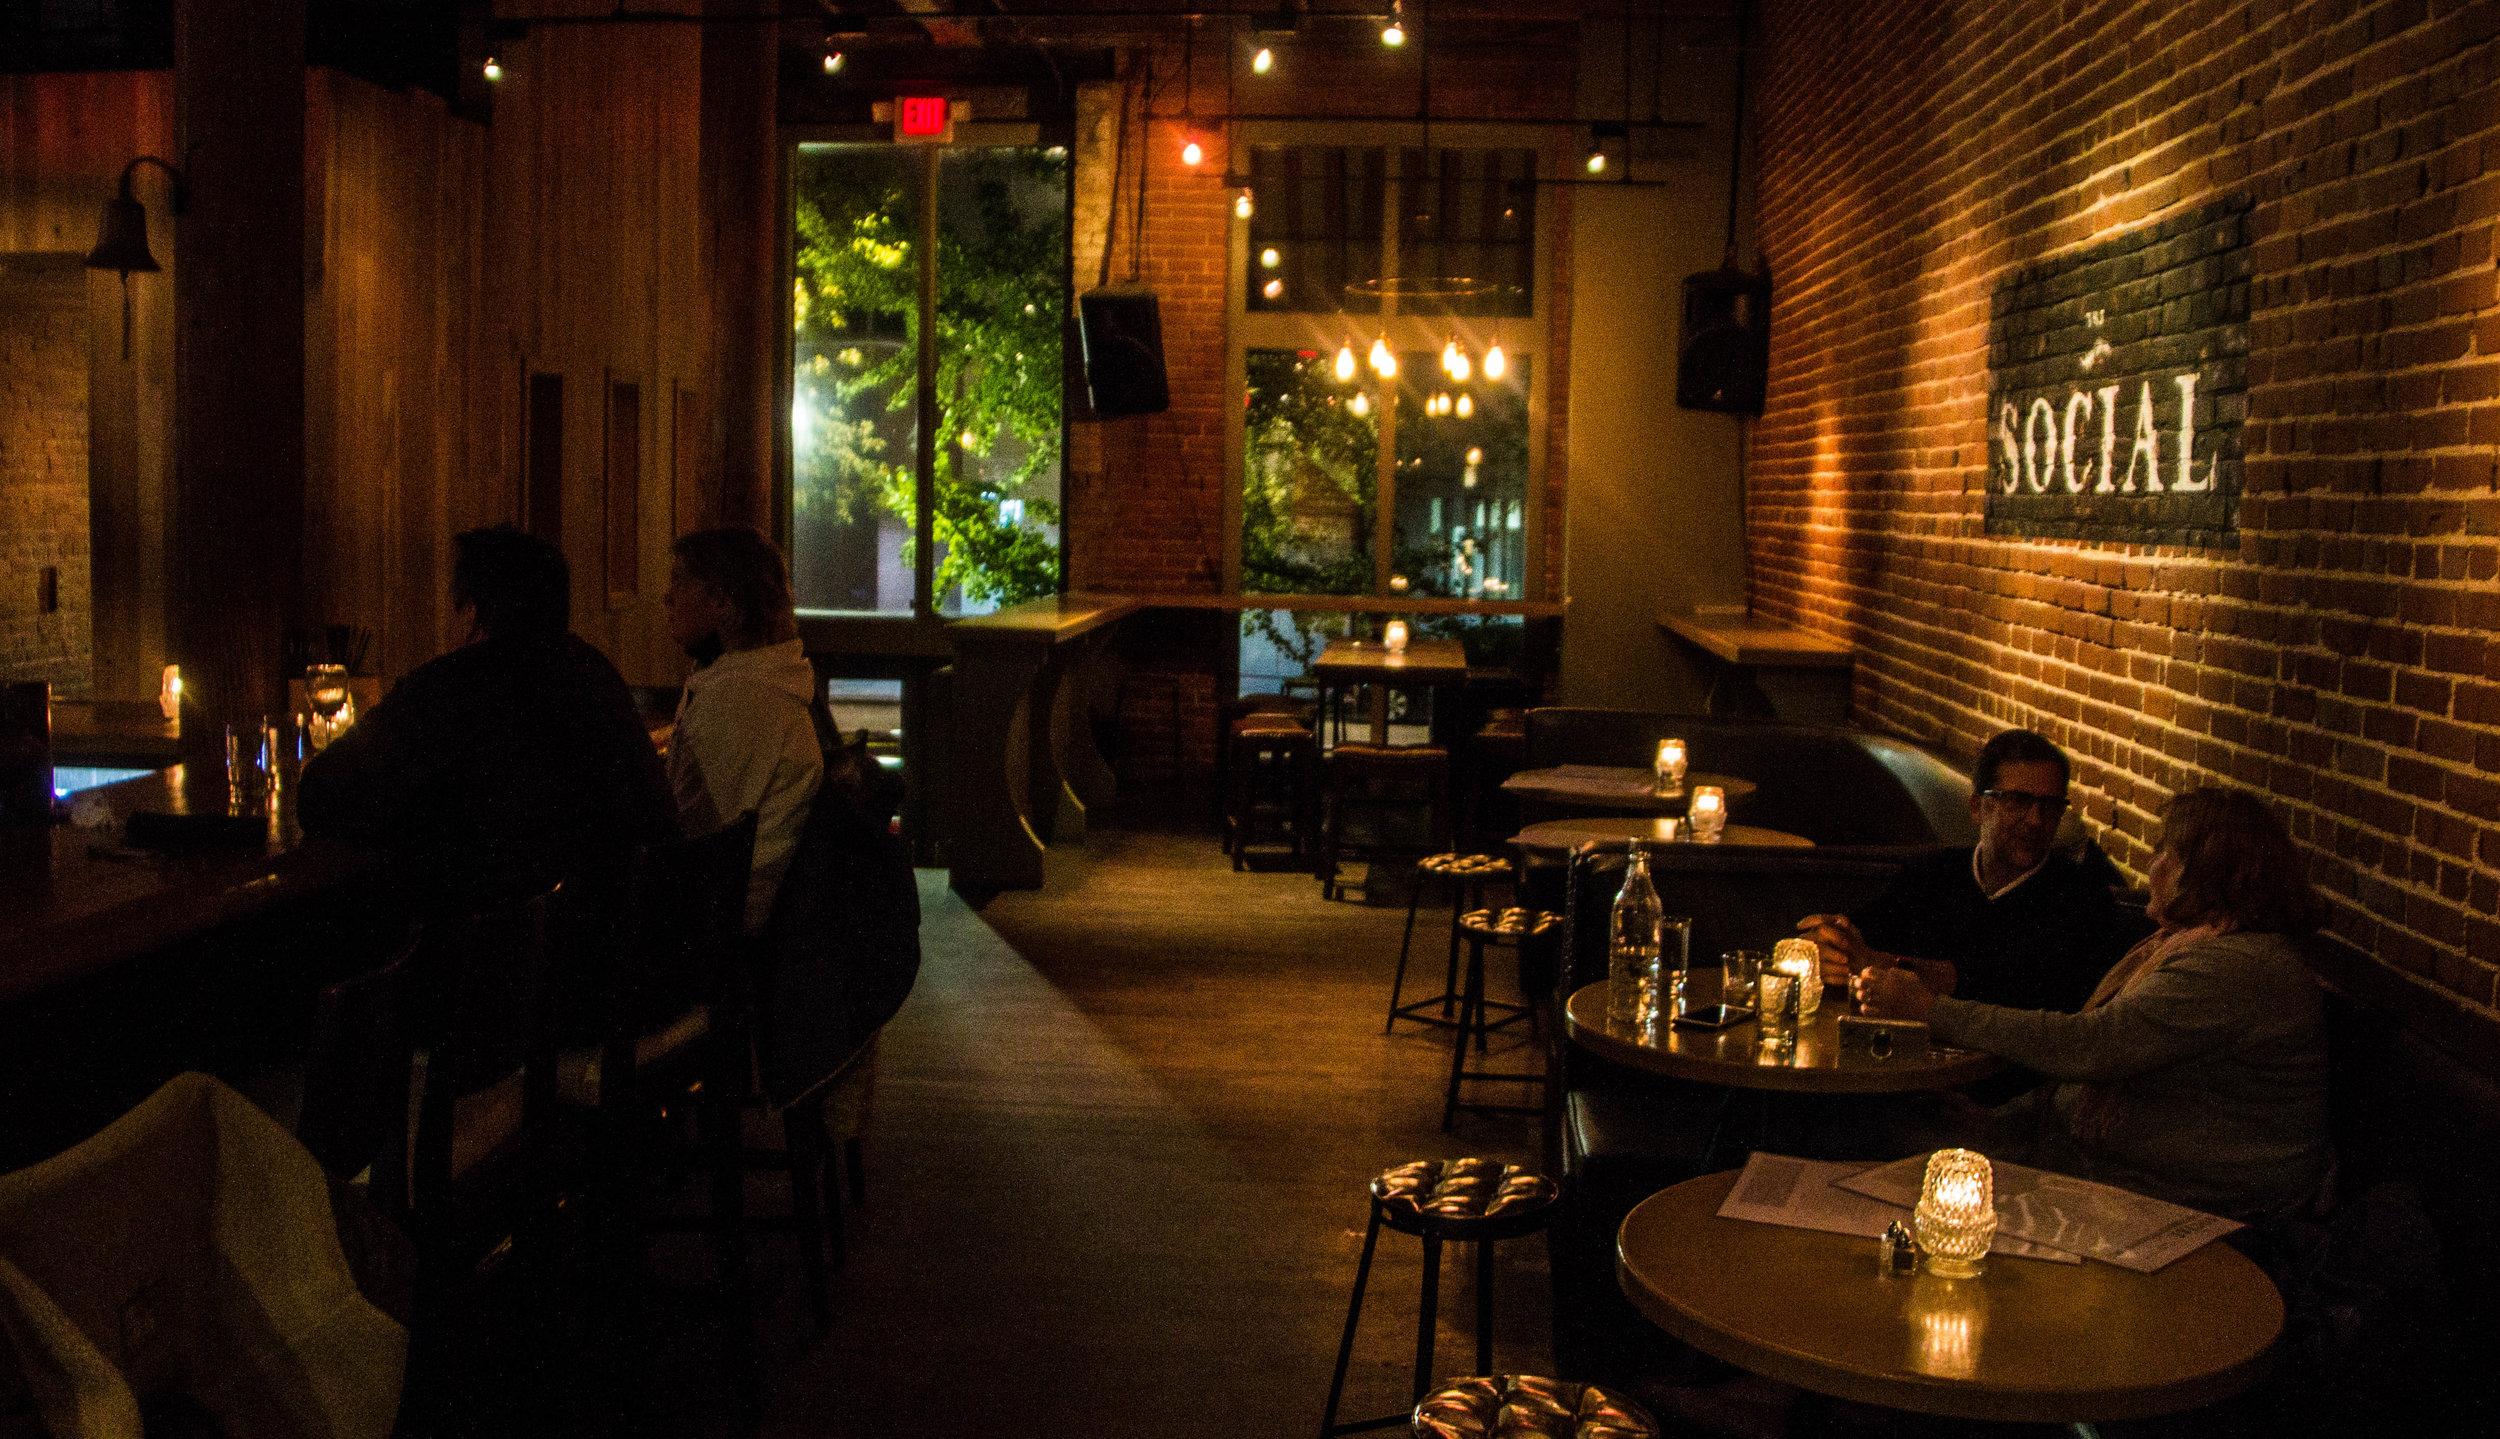 the-social-public-house-chattanooga-restaurants-3.jpg